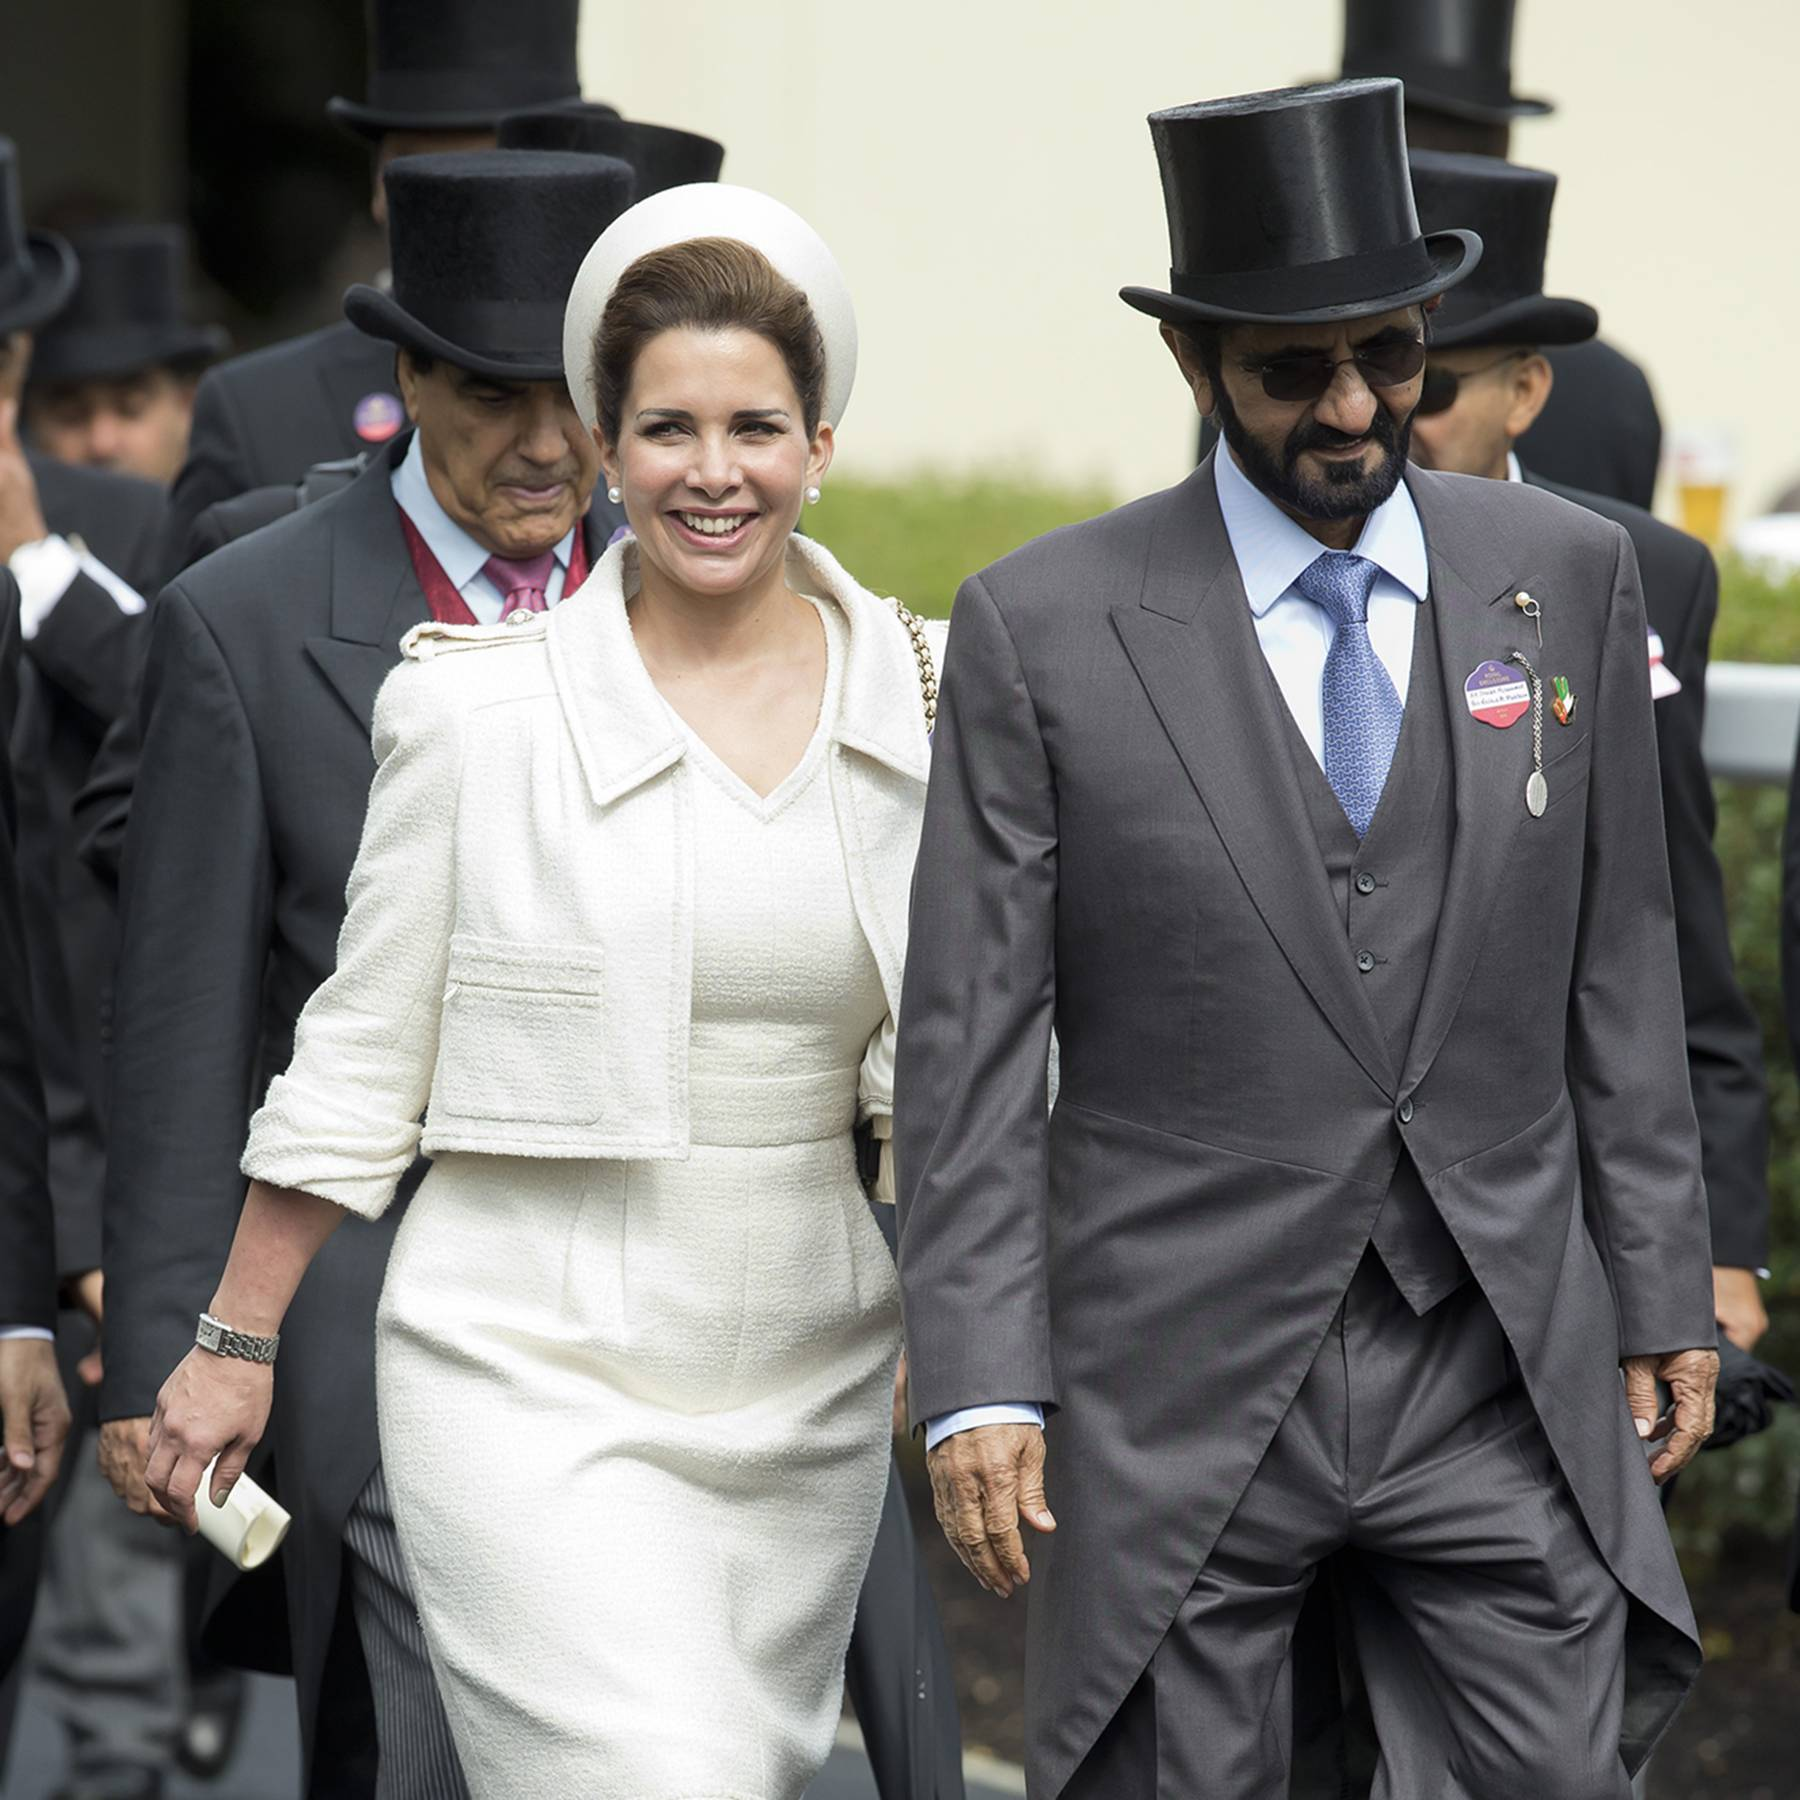 Princess Haya interview - wife of Emirate of Dubai Sheikh Mohammed bin Rashid Al Maktoum | Tatler